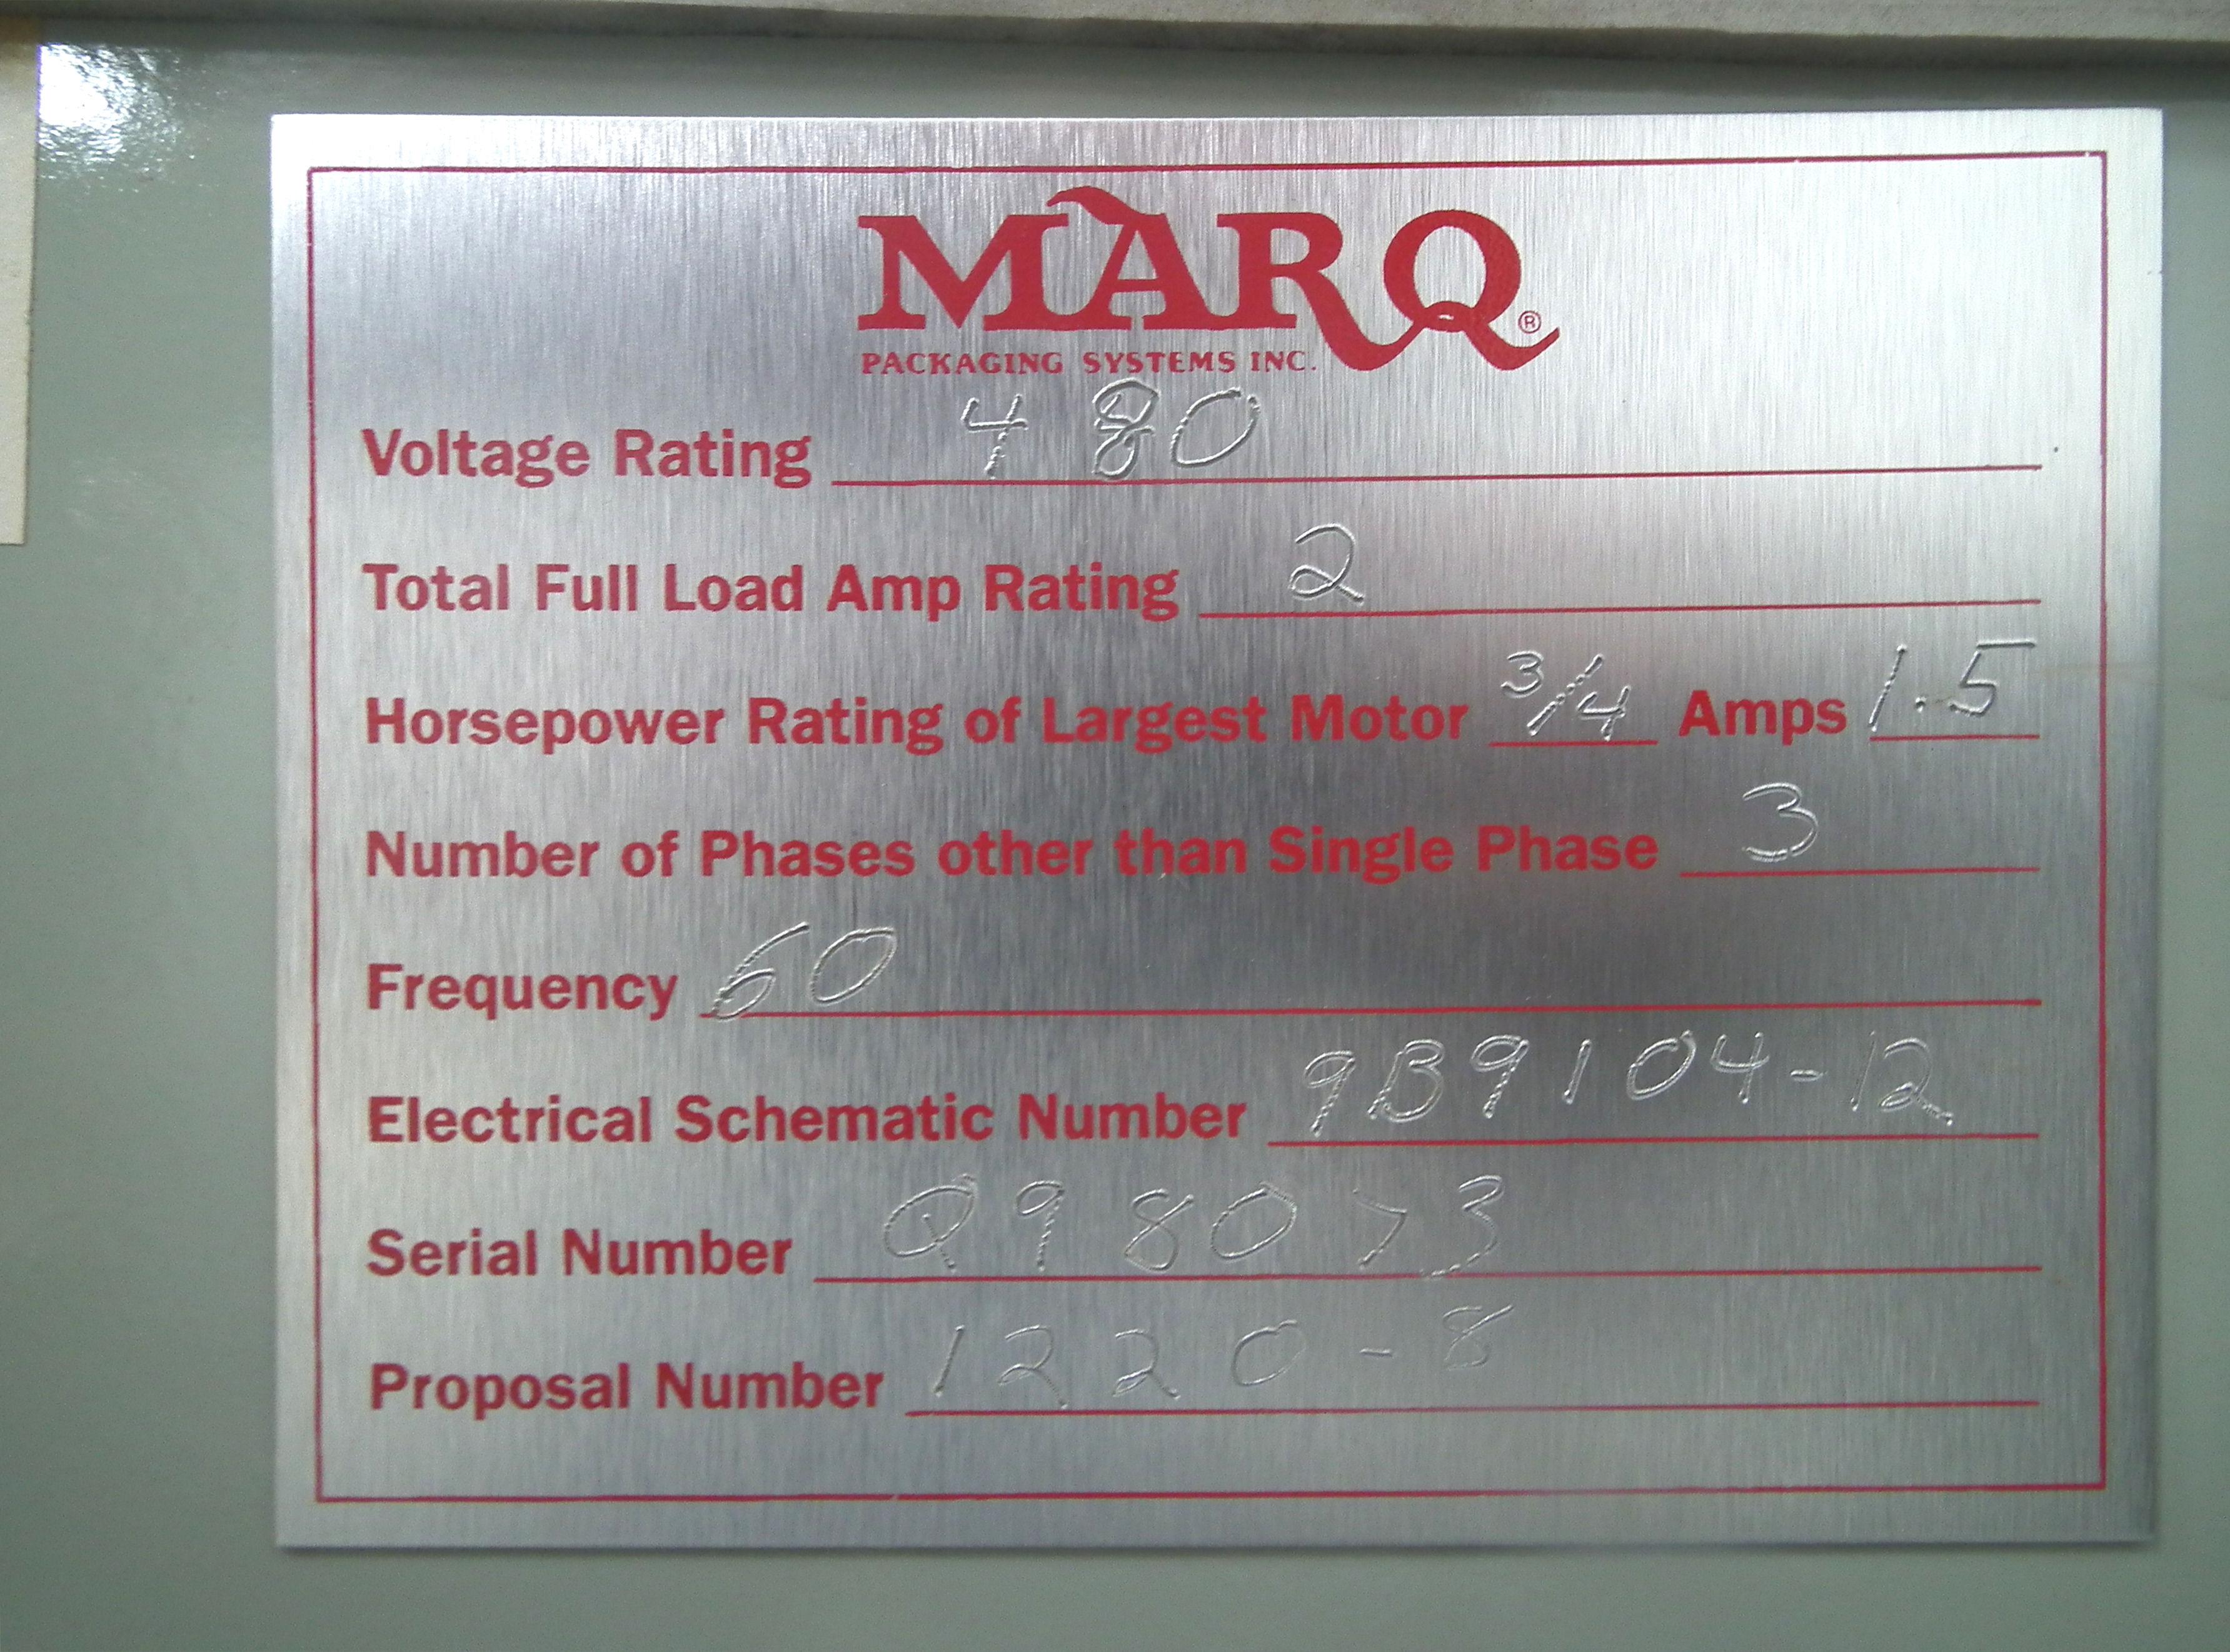 Marq Tuff HPE-NS-MF/RH/DL Bottom Tape Case Erector A9697 - Image 13 of 15